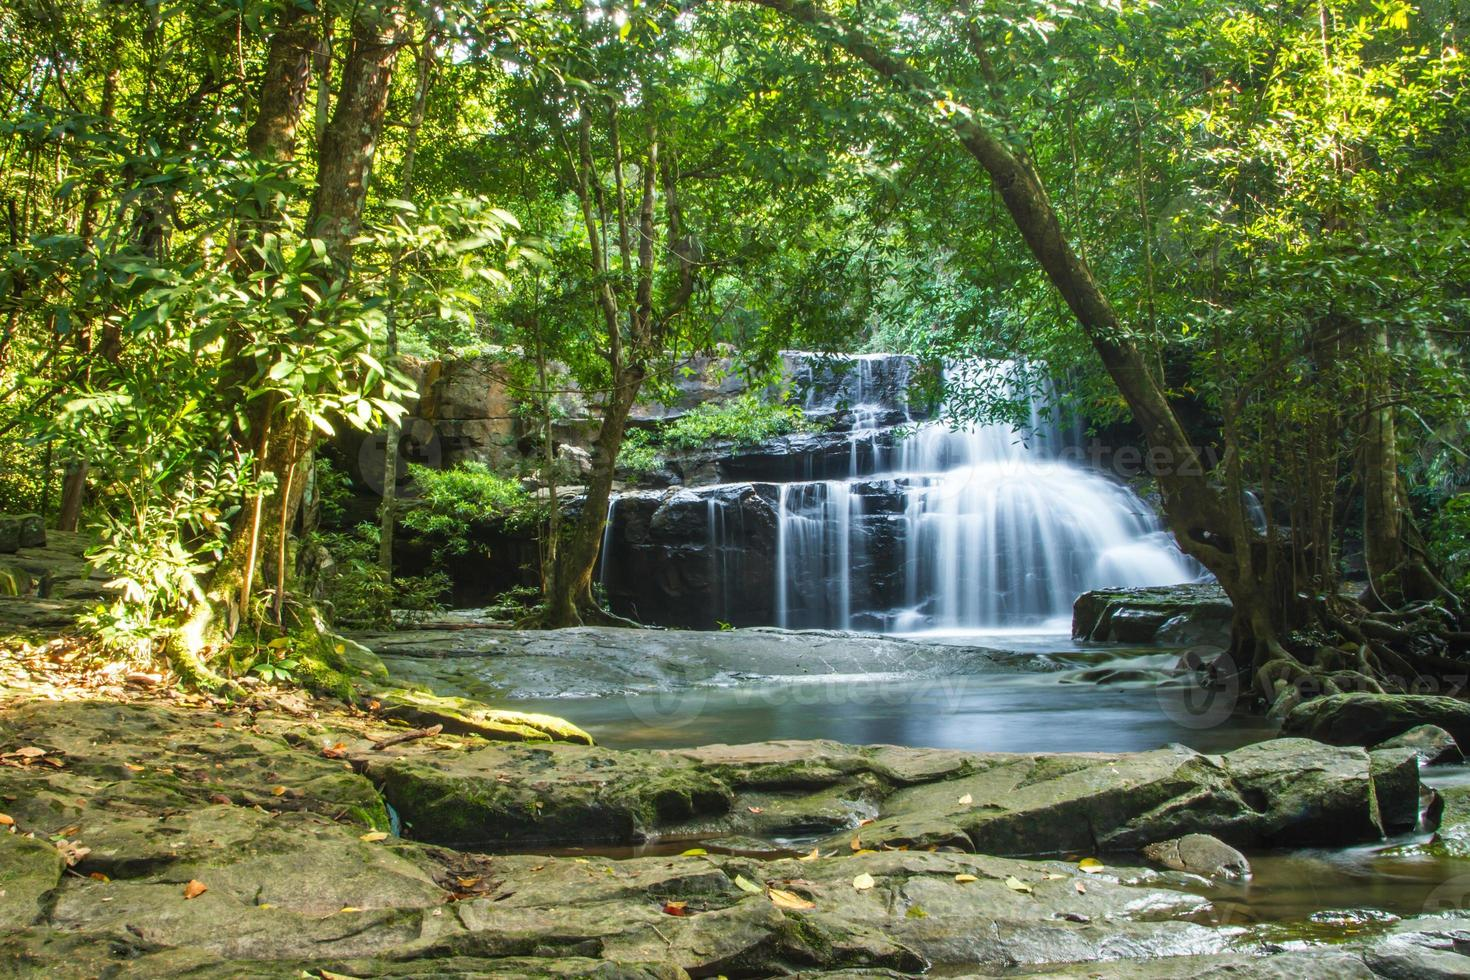 vattenfall i Thailand (pang si da vattenfall nation park) foto